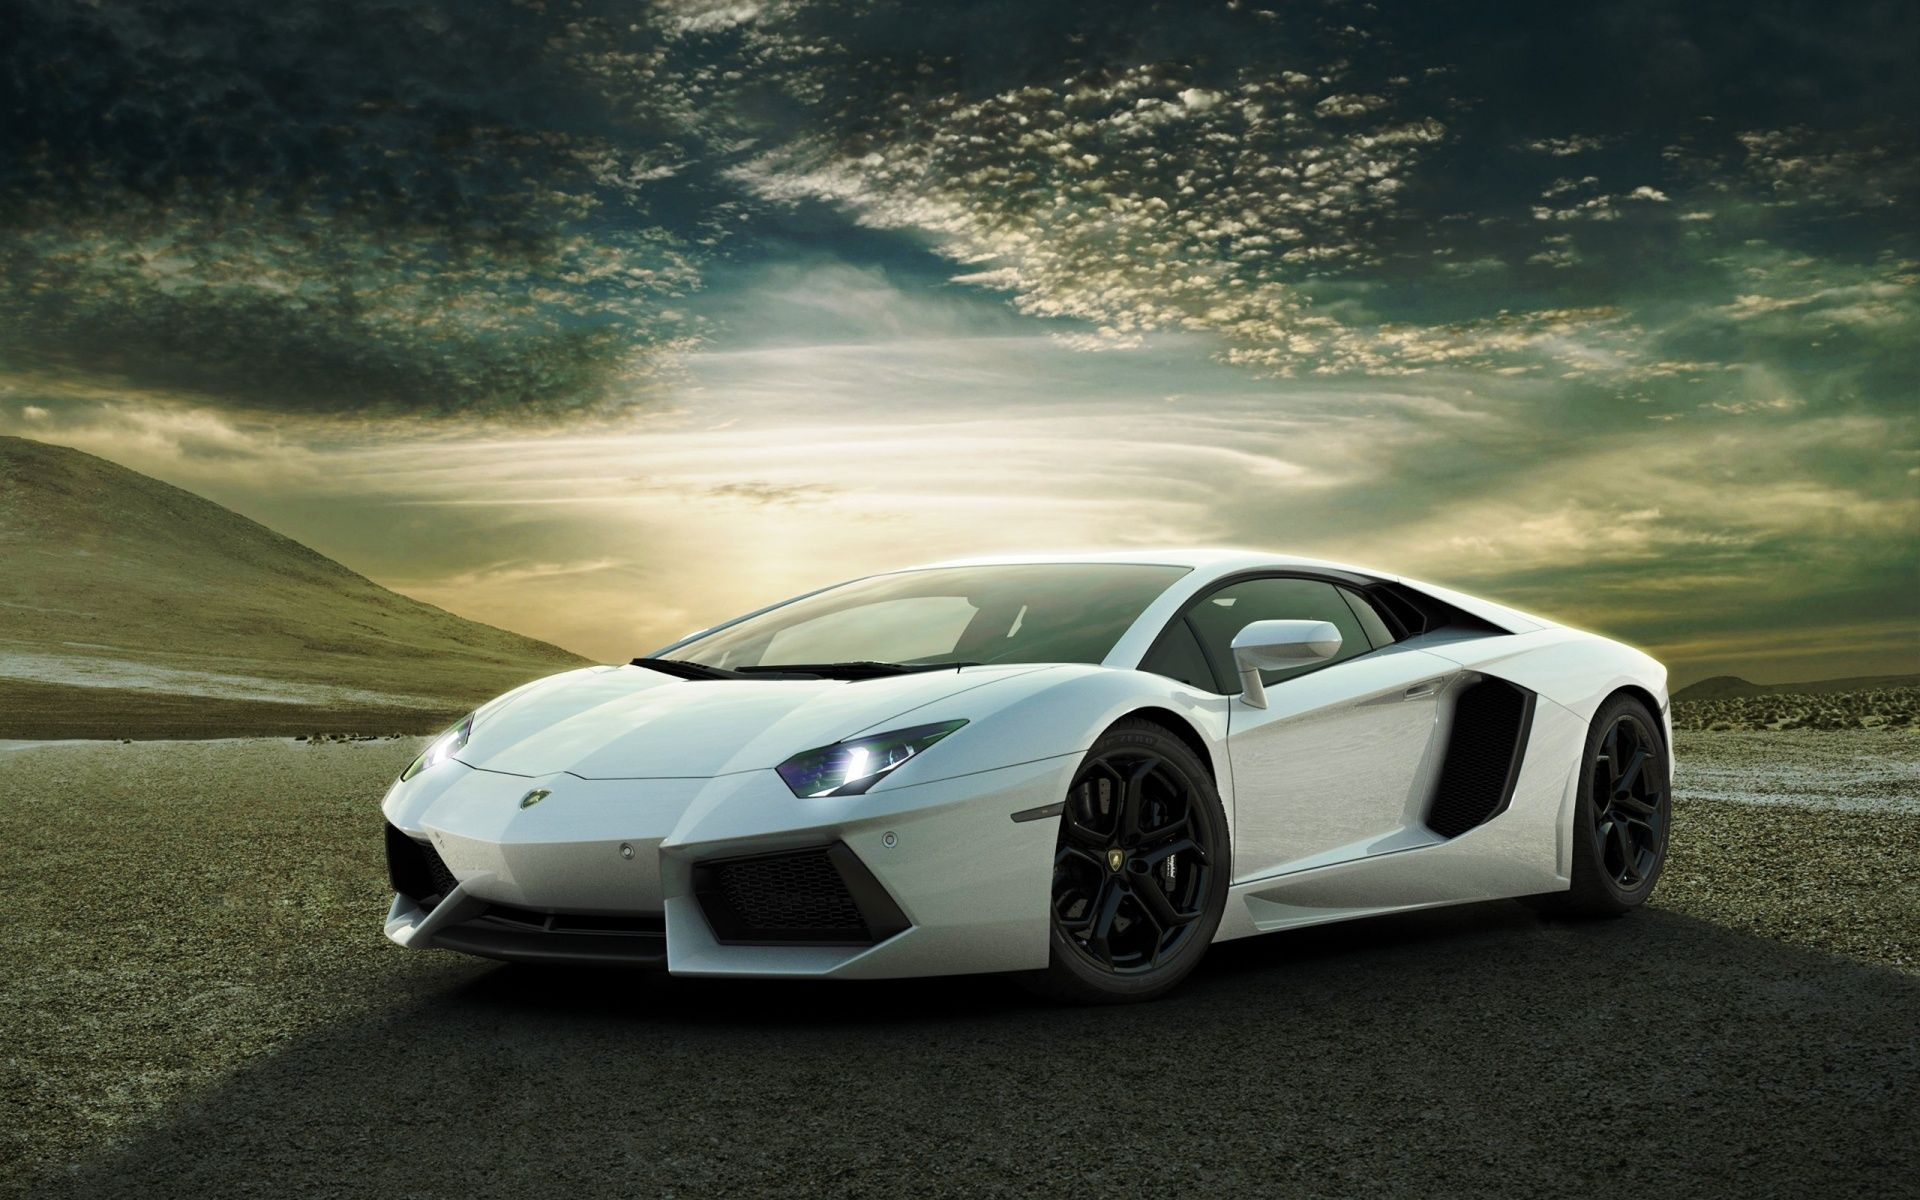 Lamborghini Wallpaper Photo Vehicles Wallpapers Pinterest Dark Wallpaper Wallpaper And Hd Desktop